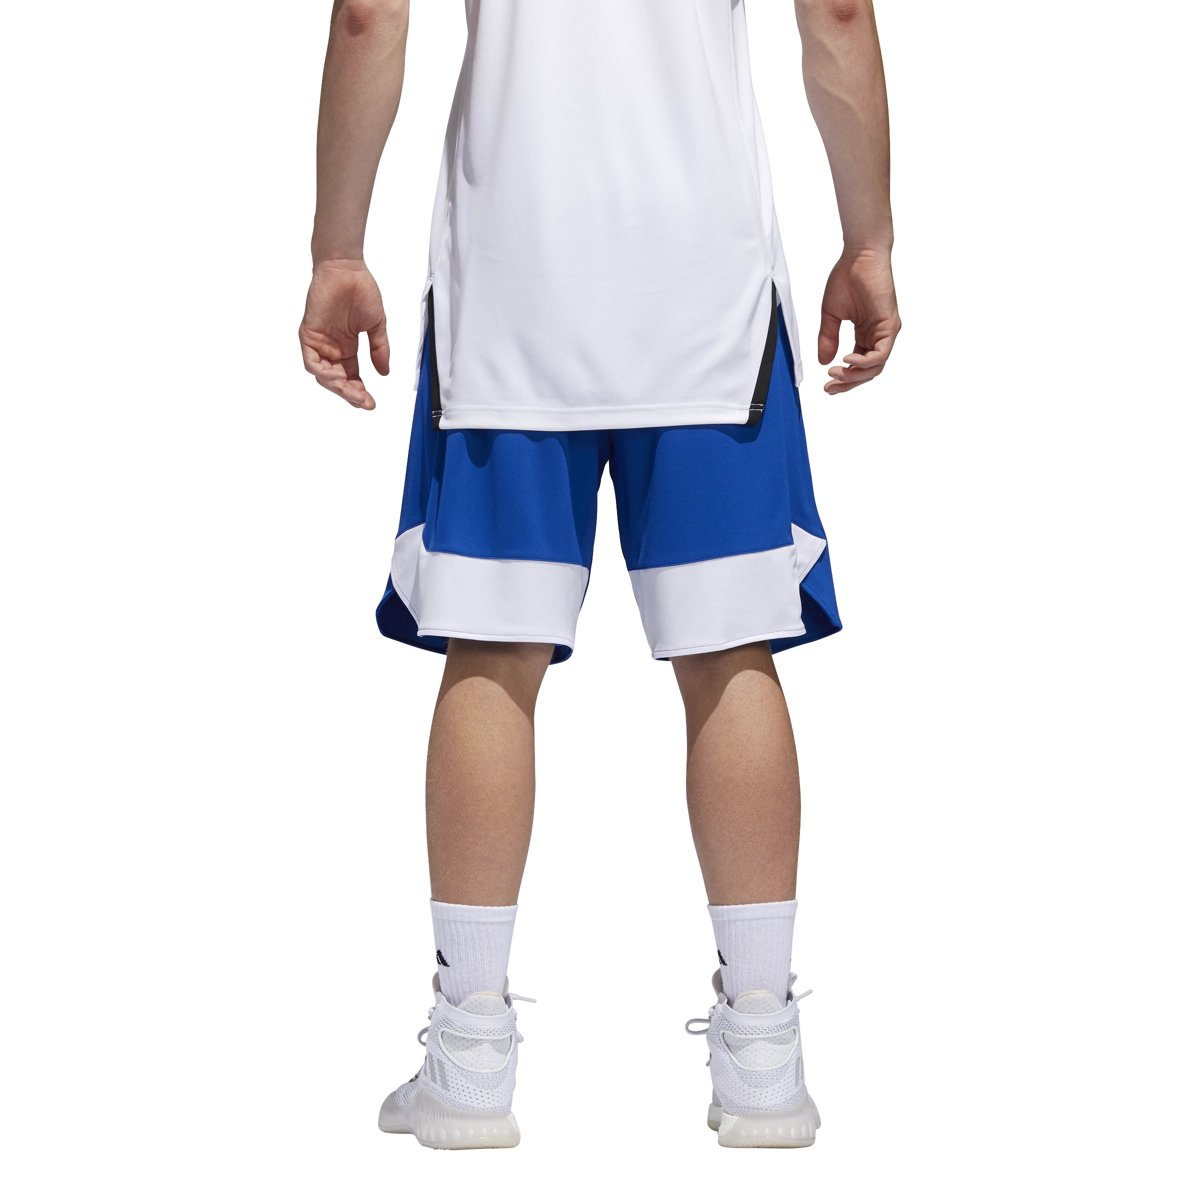 Collegiate Royal-blanc XL adidas Crazy Explosive Court